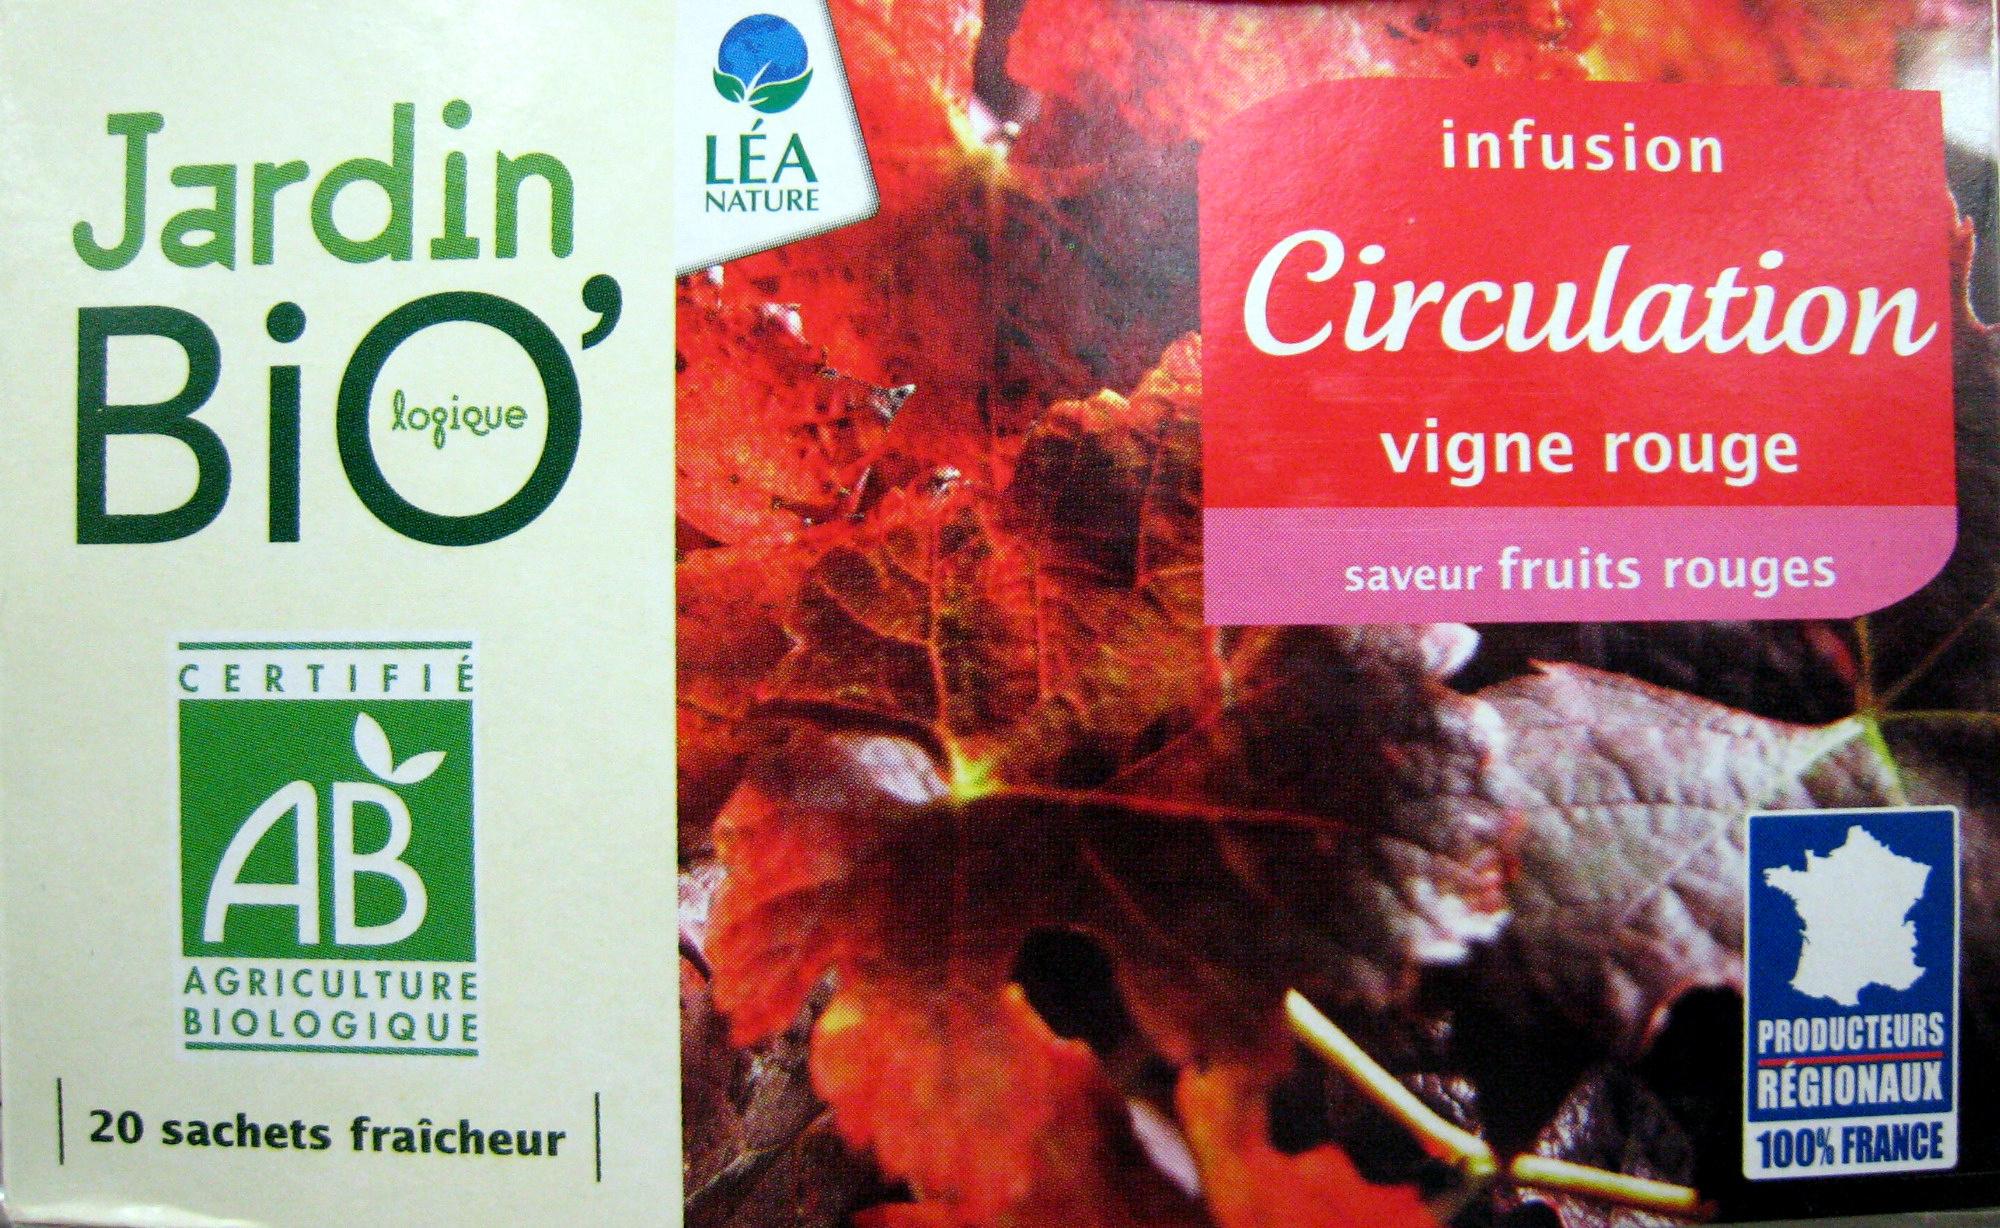 Infusion Circulation Vigne Rouge Jardin Bio - 30 G (20 ... encequiconcerne Infusion Jardin Bio